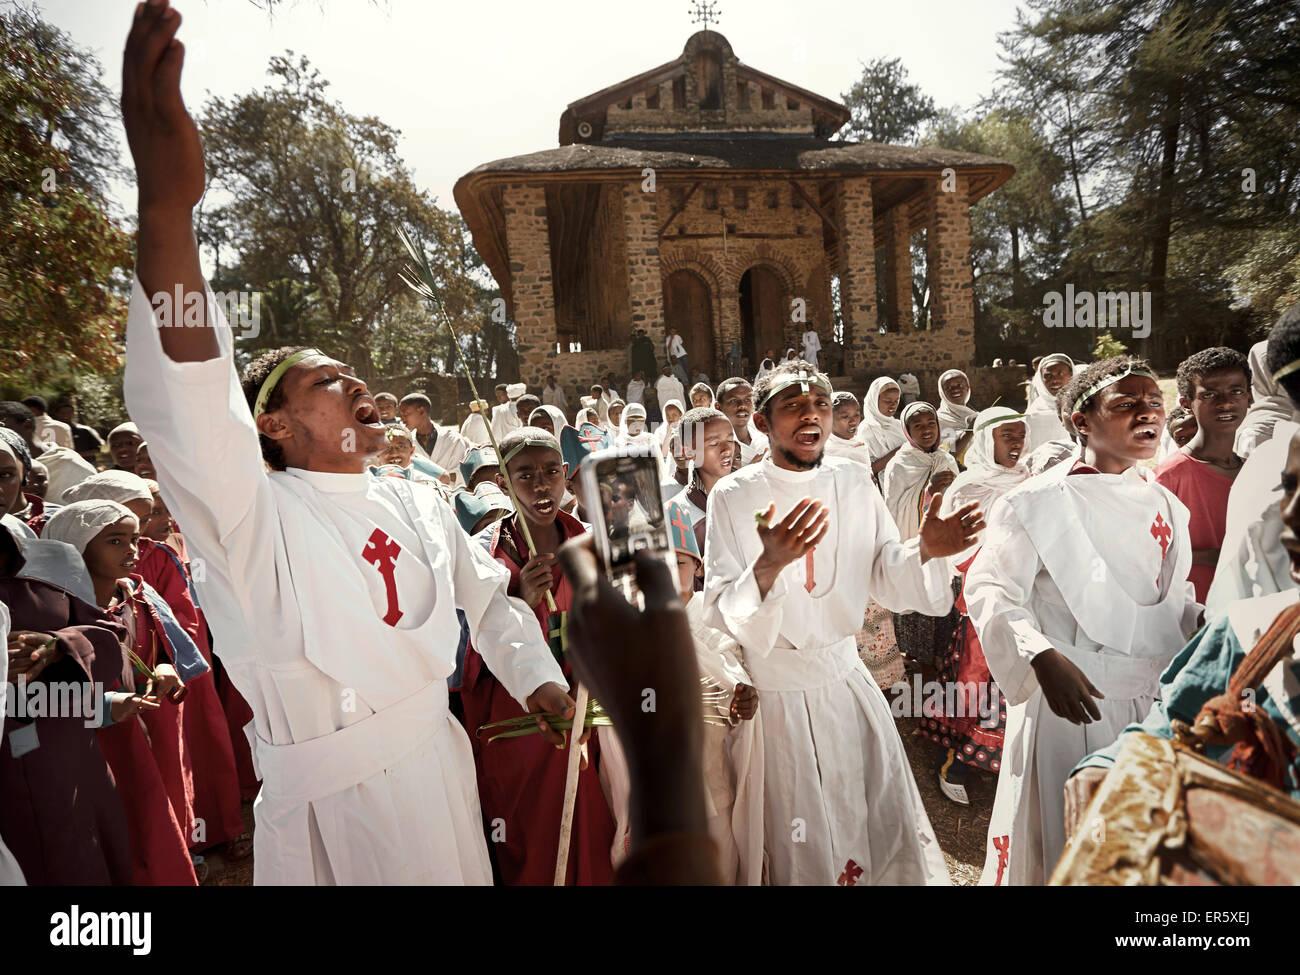 Members of convent school celebrating, Debre Berhan Selassie, Gondar, Amhara region, Ethiopia - Stock Image